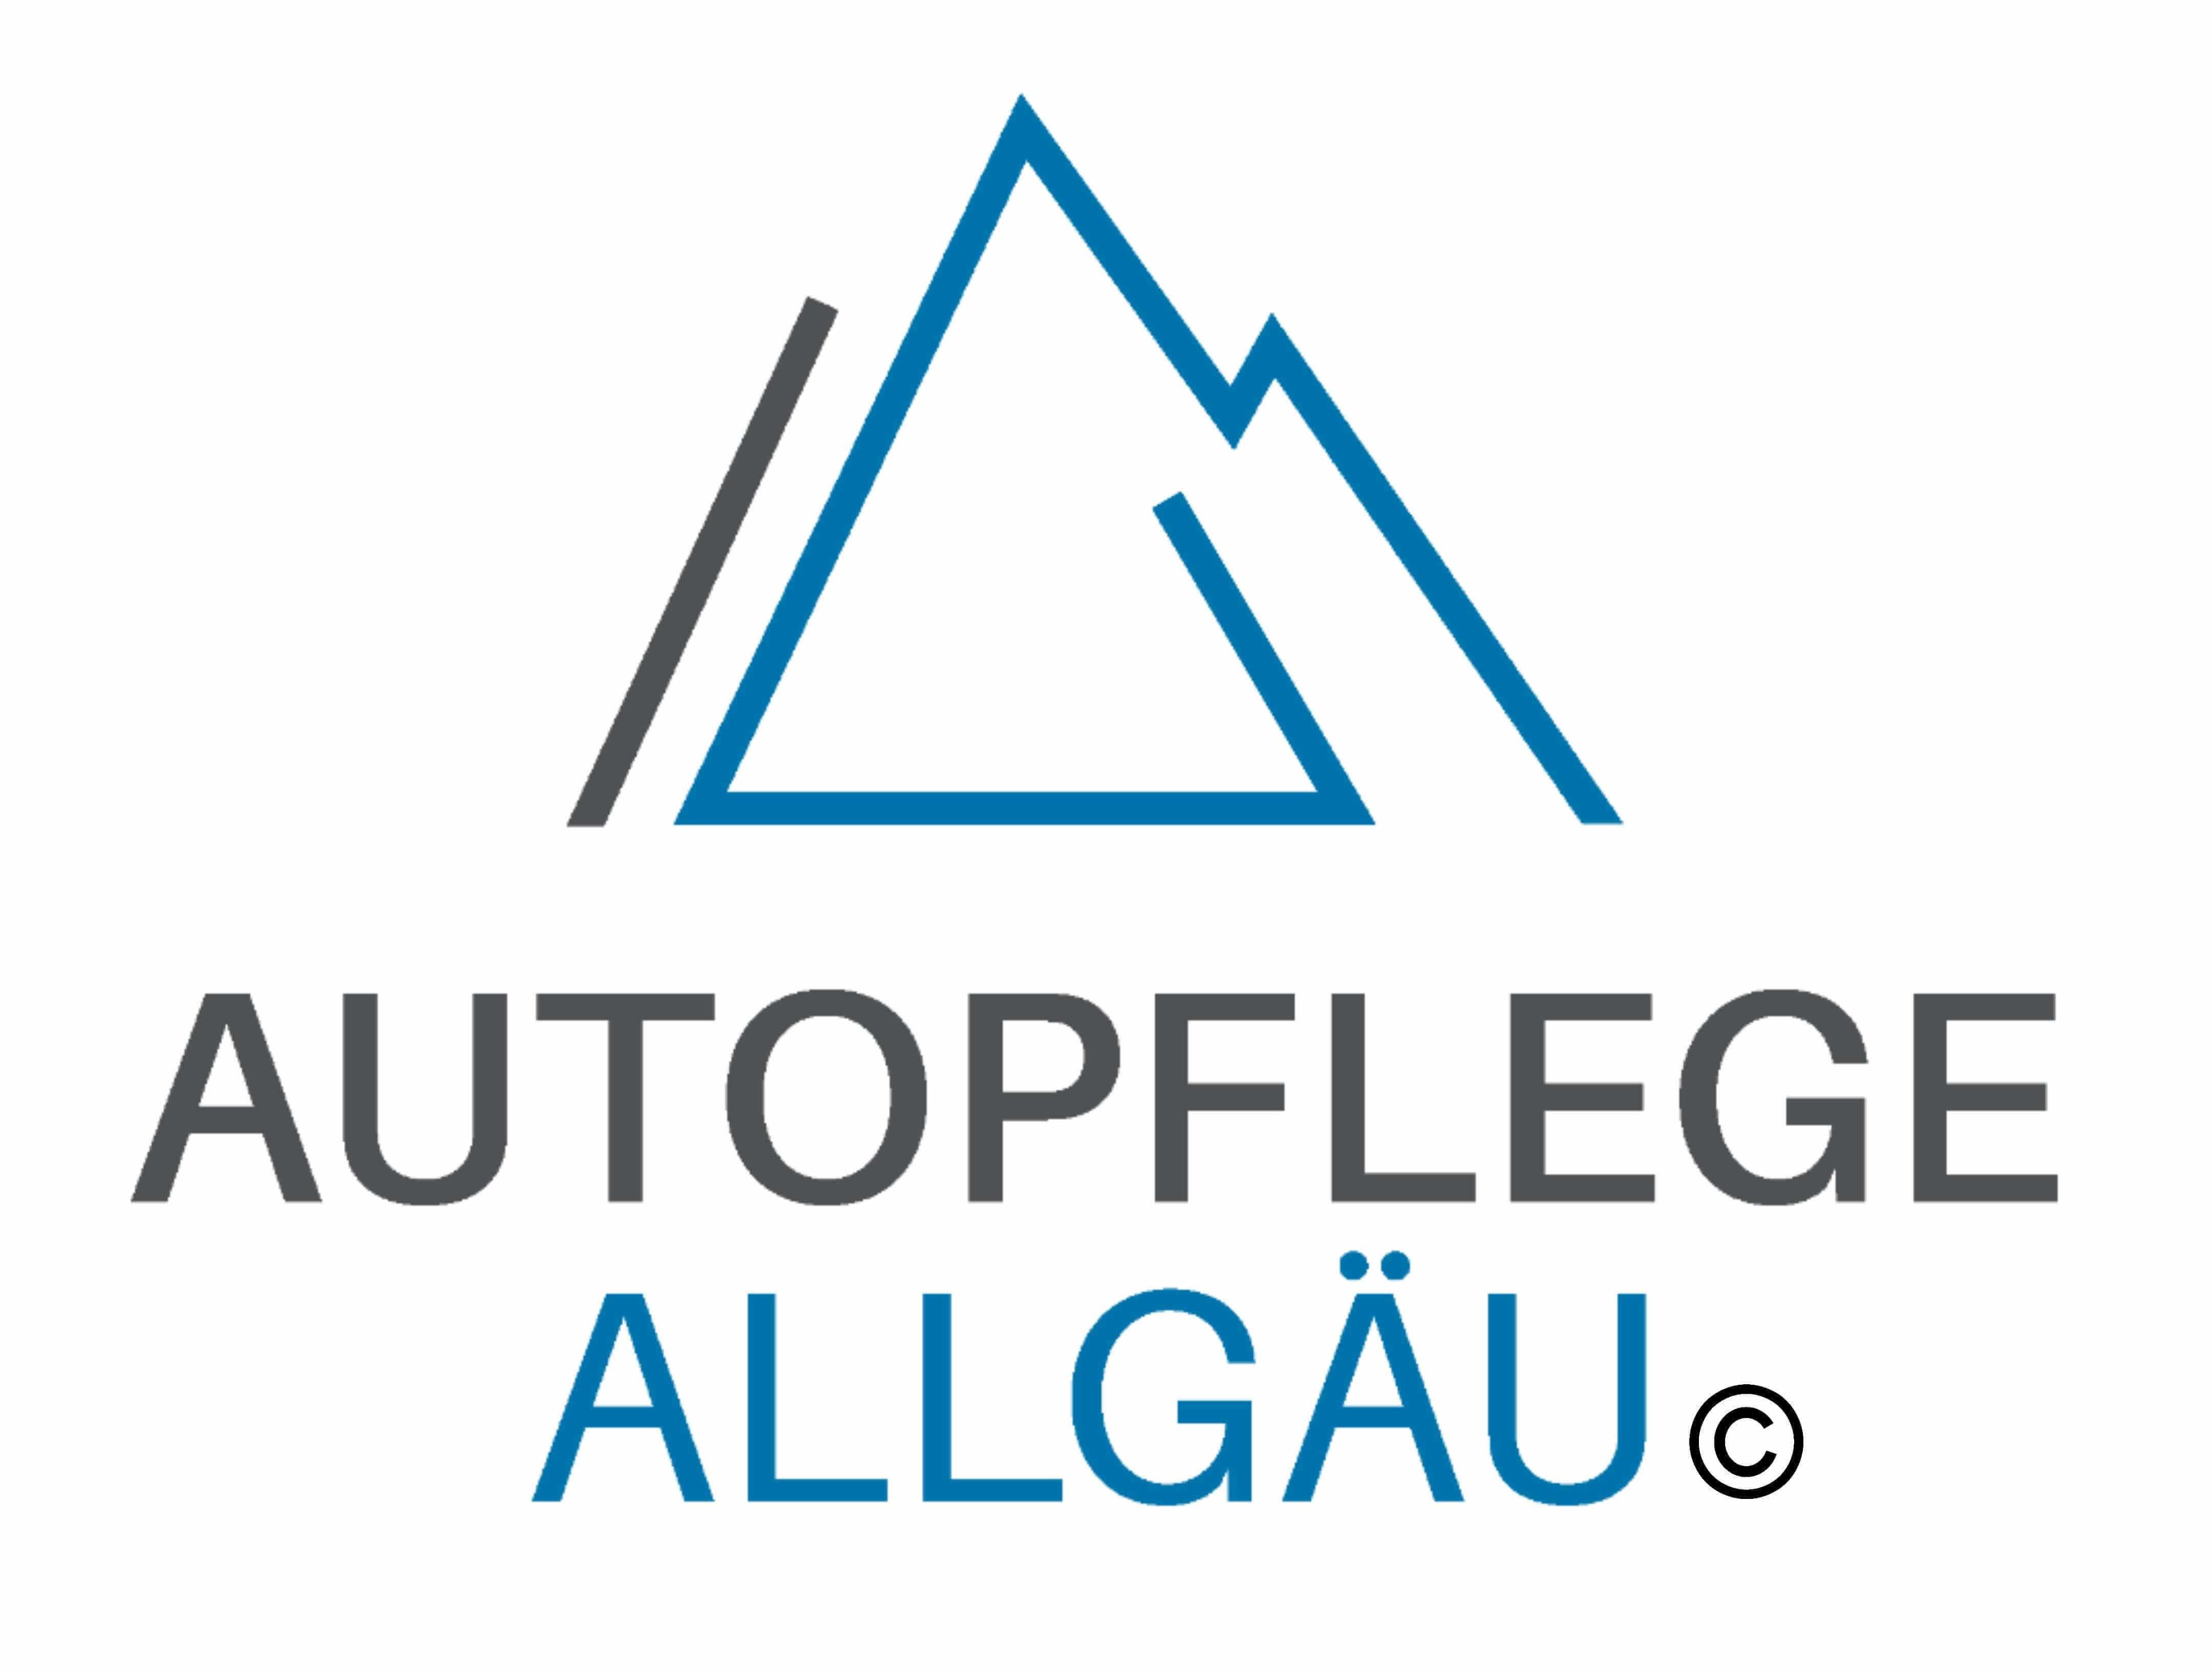 Autopflege Allgäu